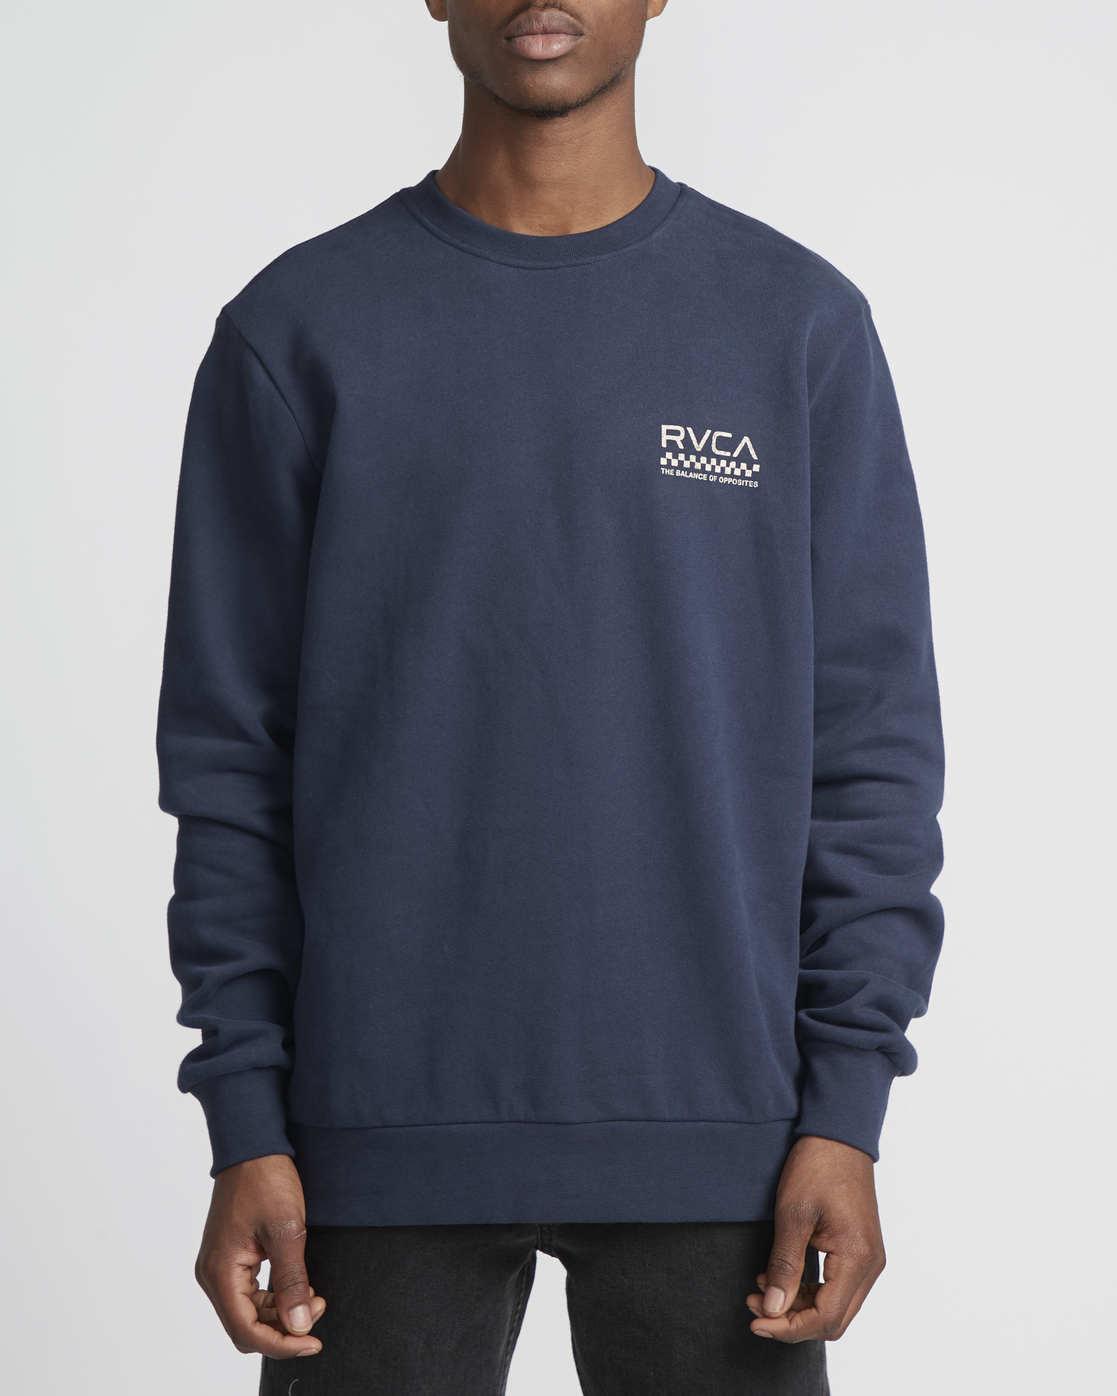 4 Check Mate Crew  - Sweatshirt  Q1CRRGRVF9 RVCA